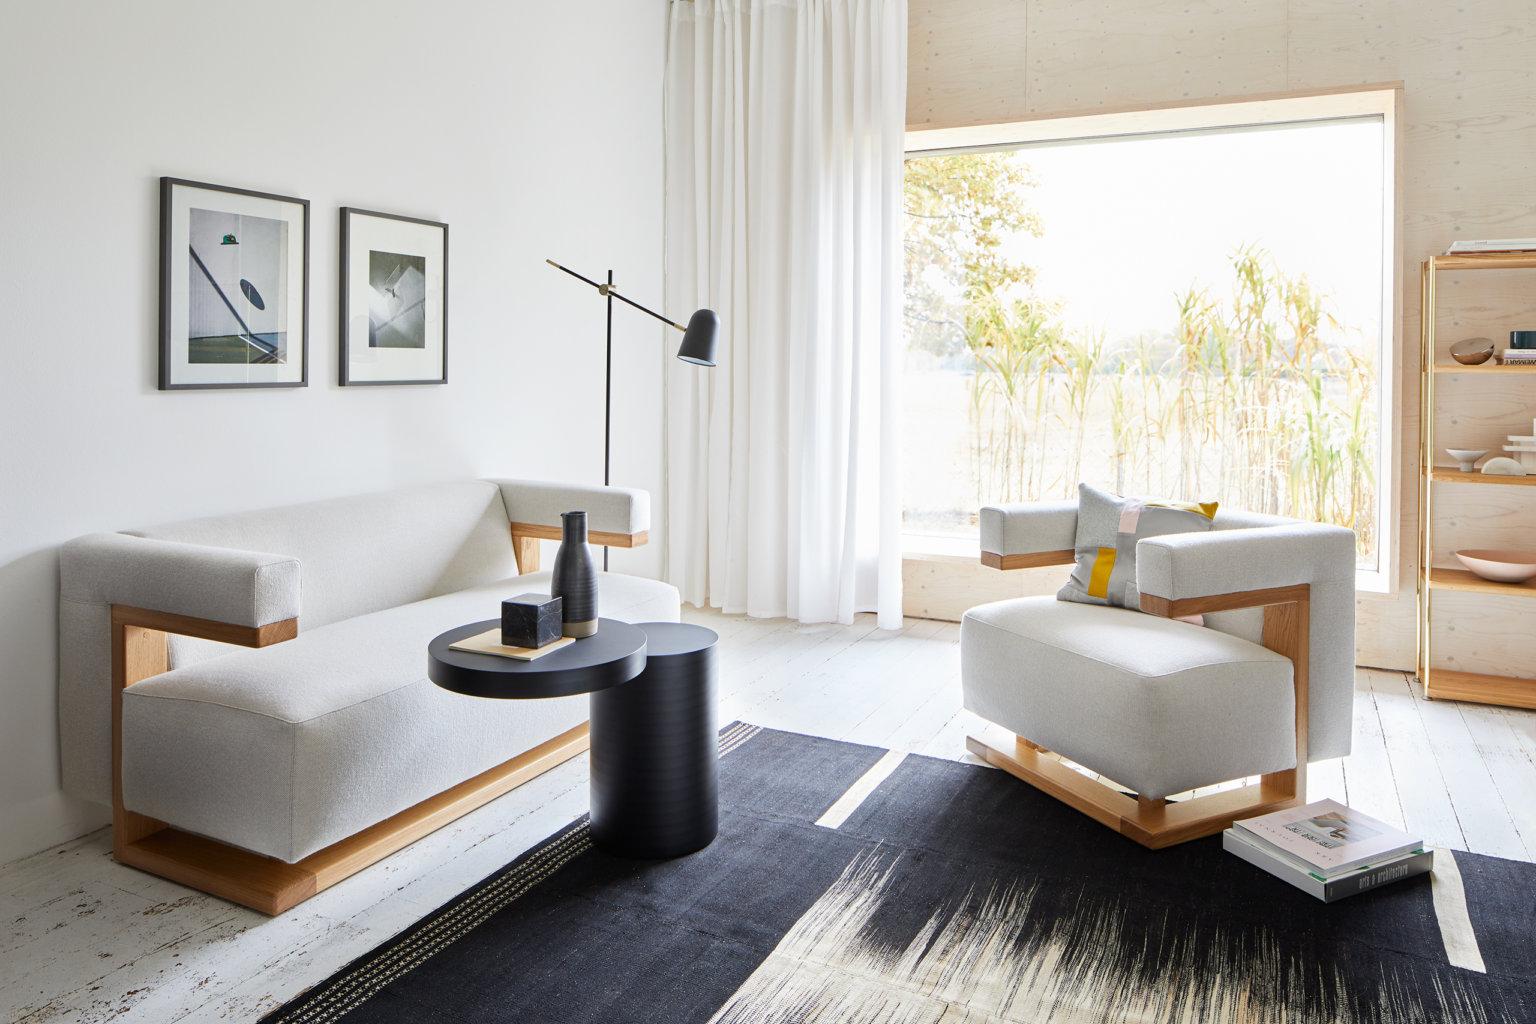 german bauhaus style interior decor living room